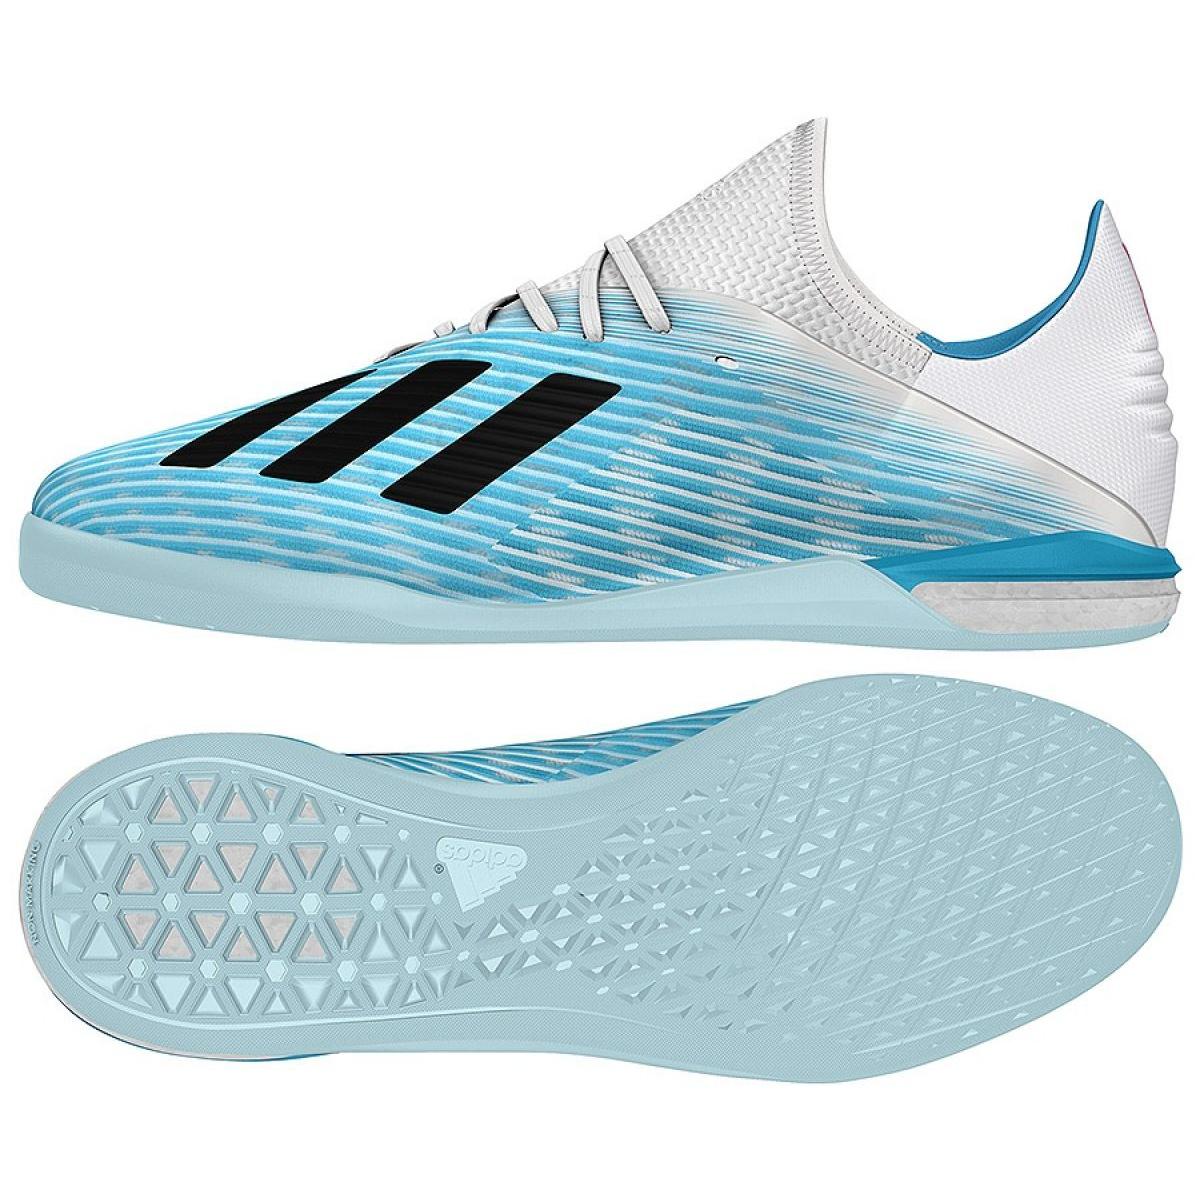 pick up on feet at sale Hallenschuhe adidas X 19.1 In M G25754 blau blau